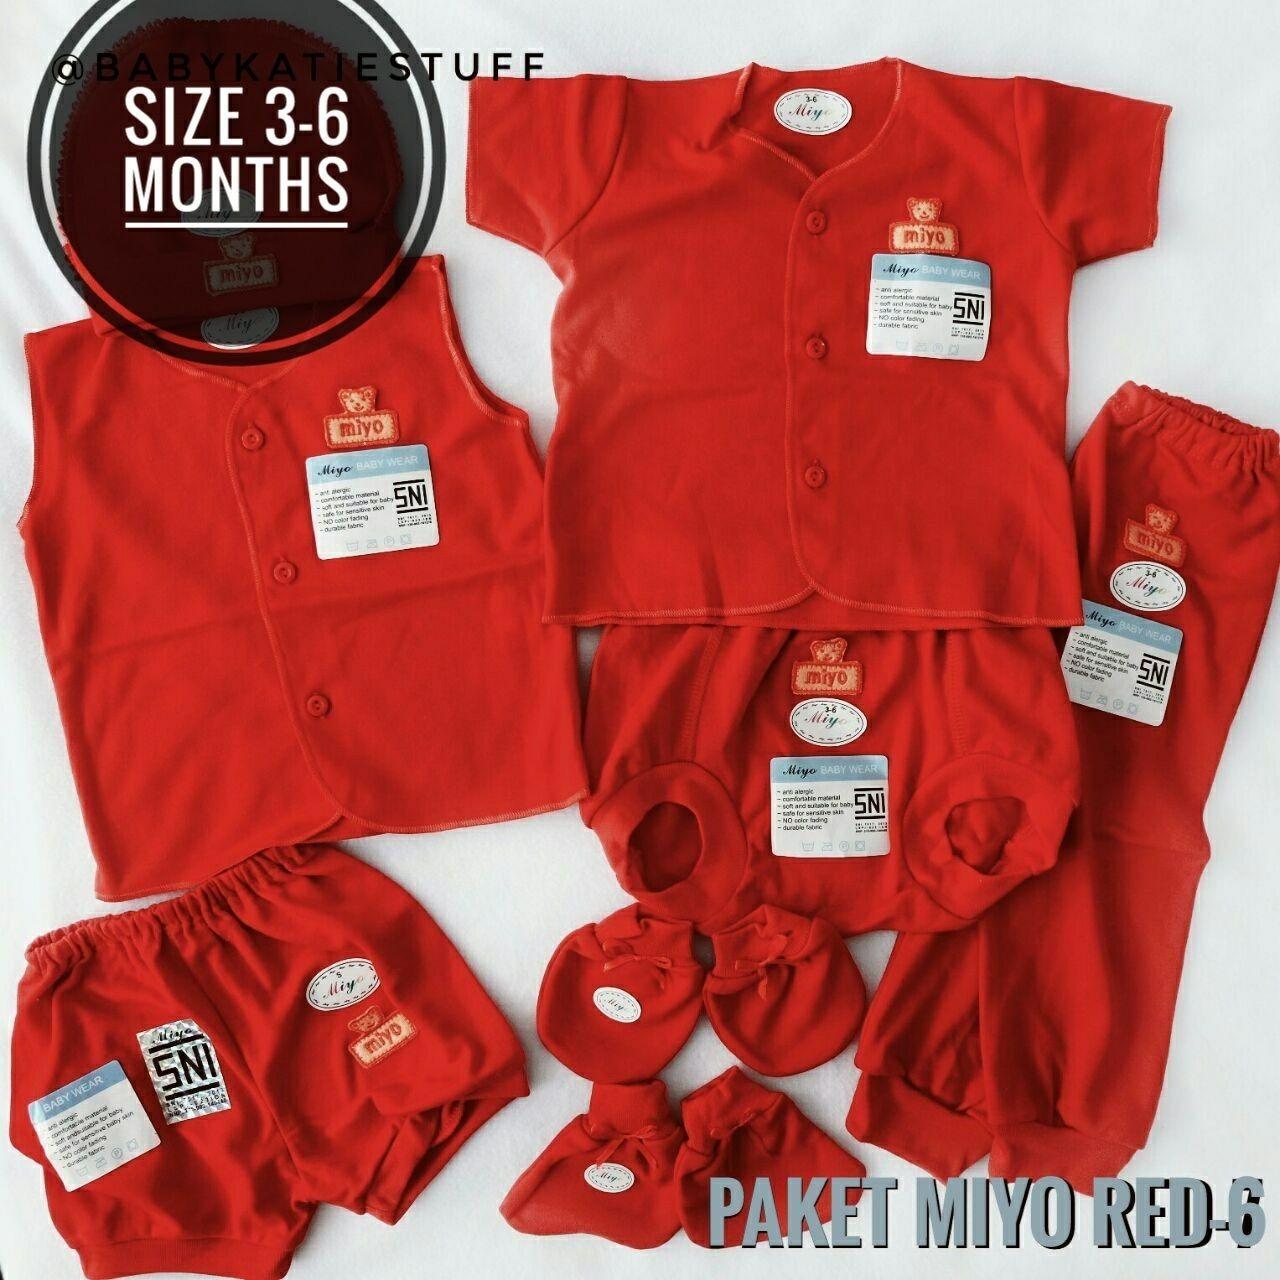 Kehebatan Set 6pcs Baju Bayi Newborn Lengan Panjang Paling Murah Dan Babykatie Paket Miyo Red 3 6 Baby